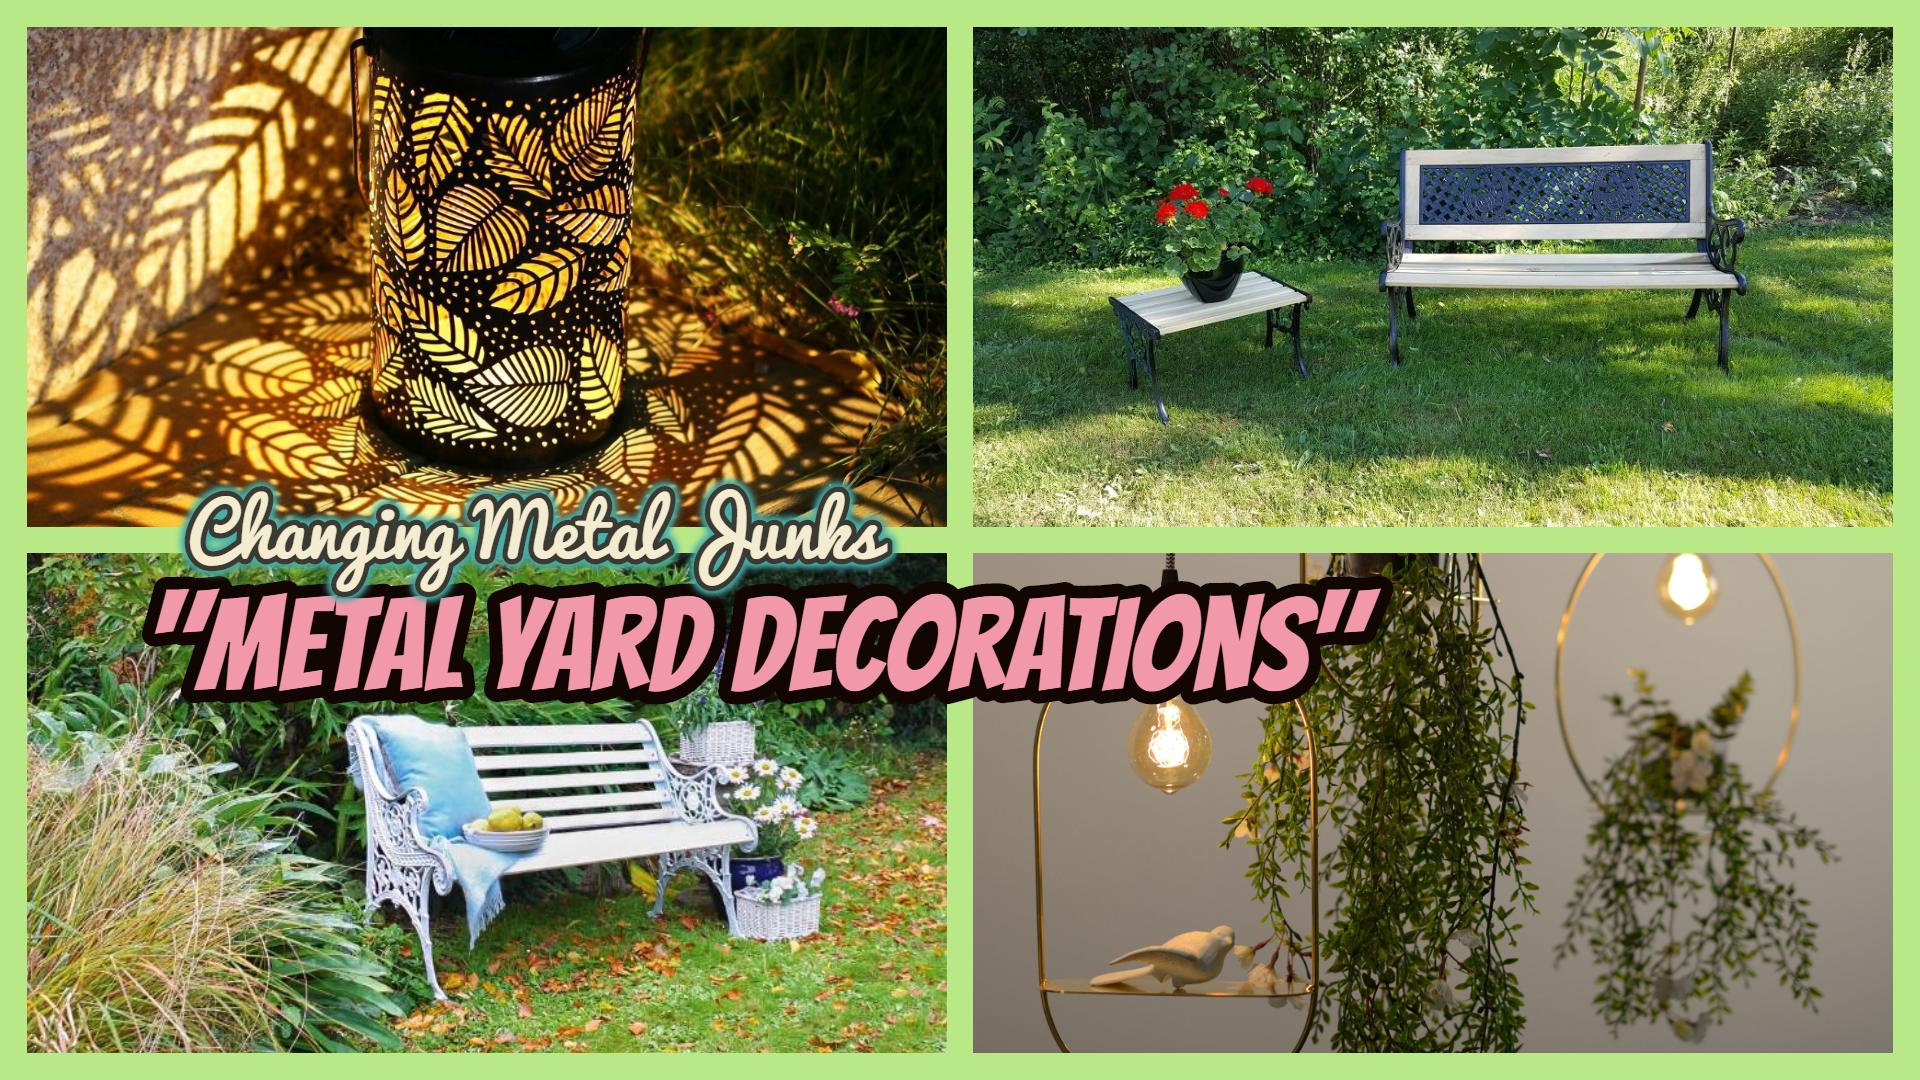 Metal Yard Decorations